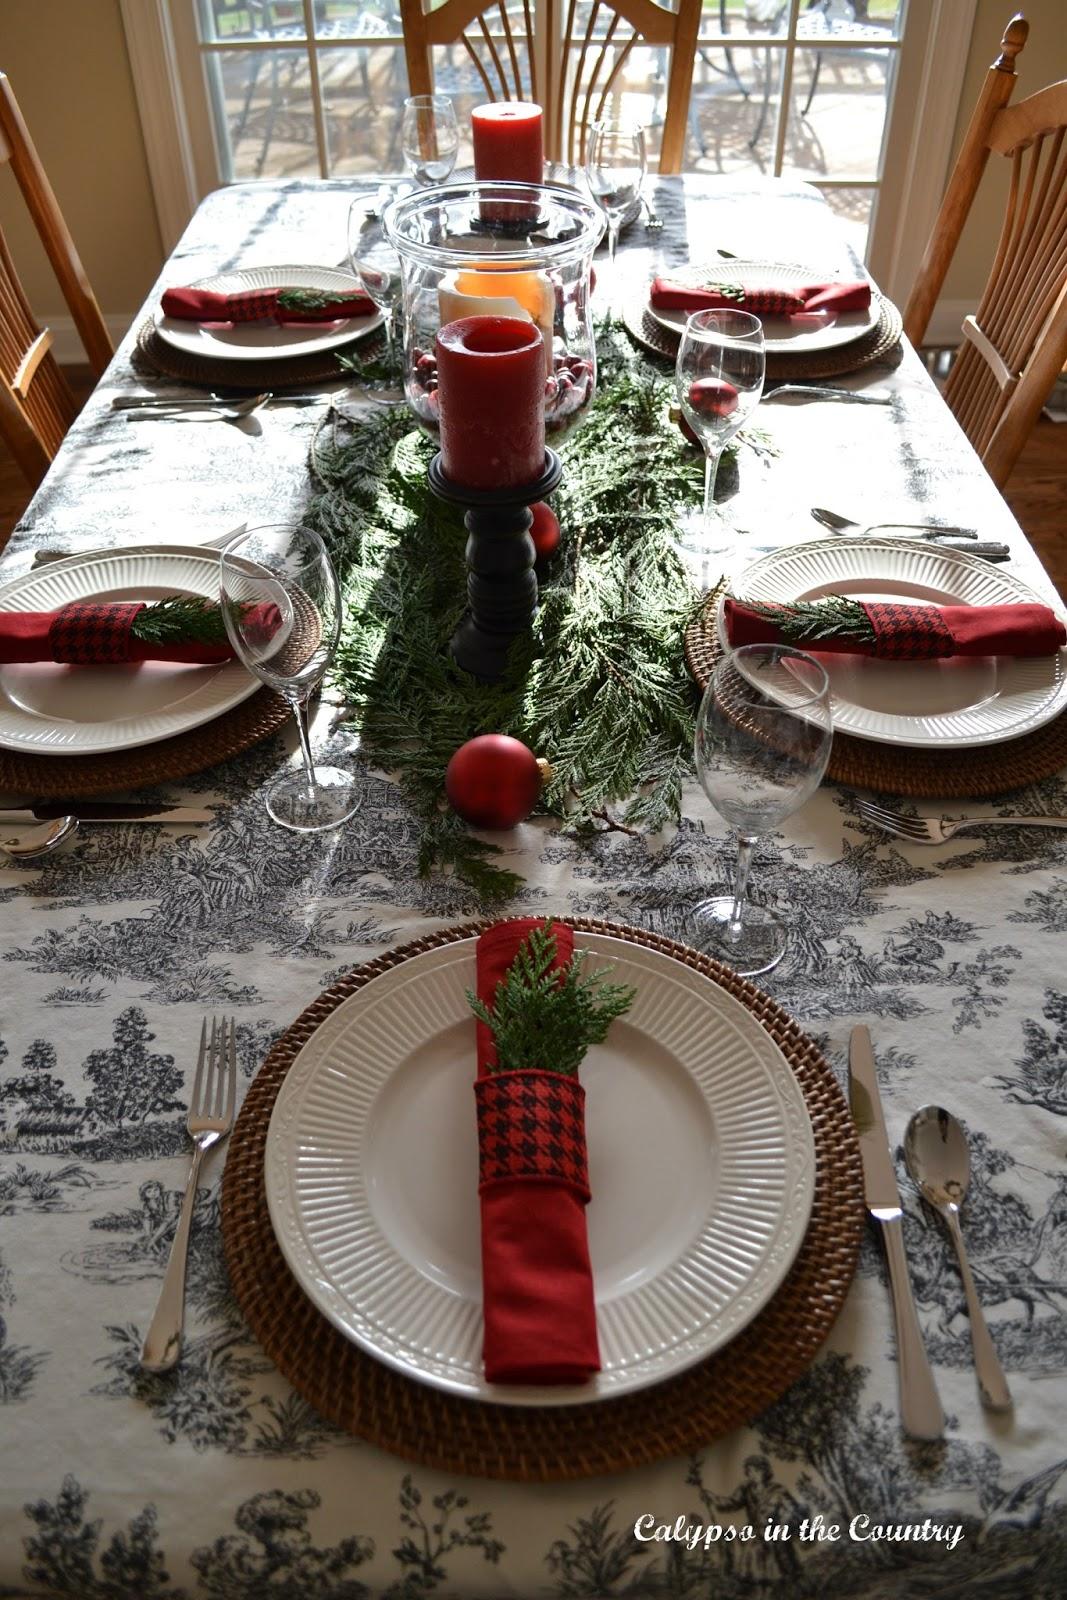 Toile Table Setting for Christmas